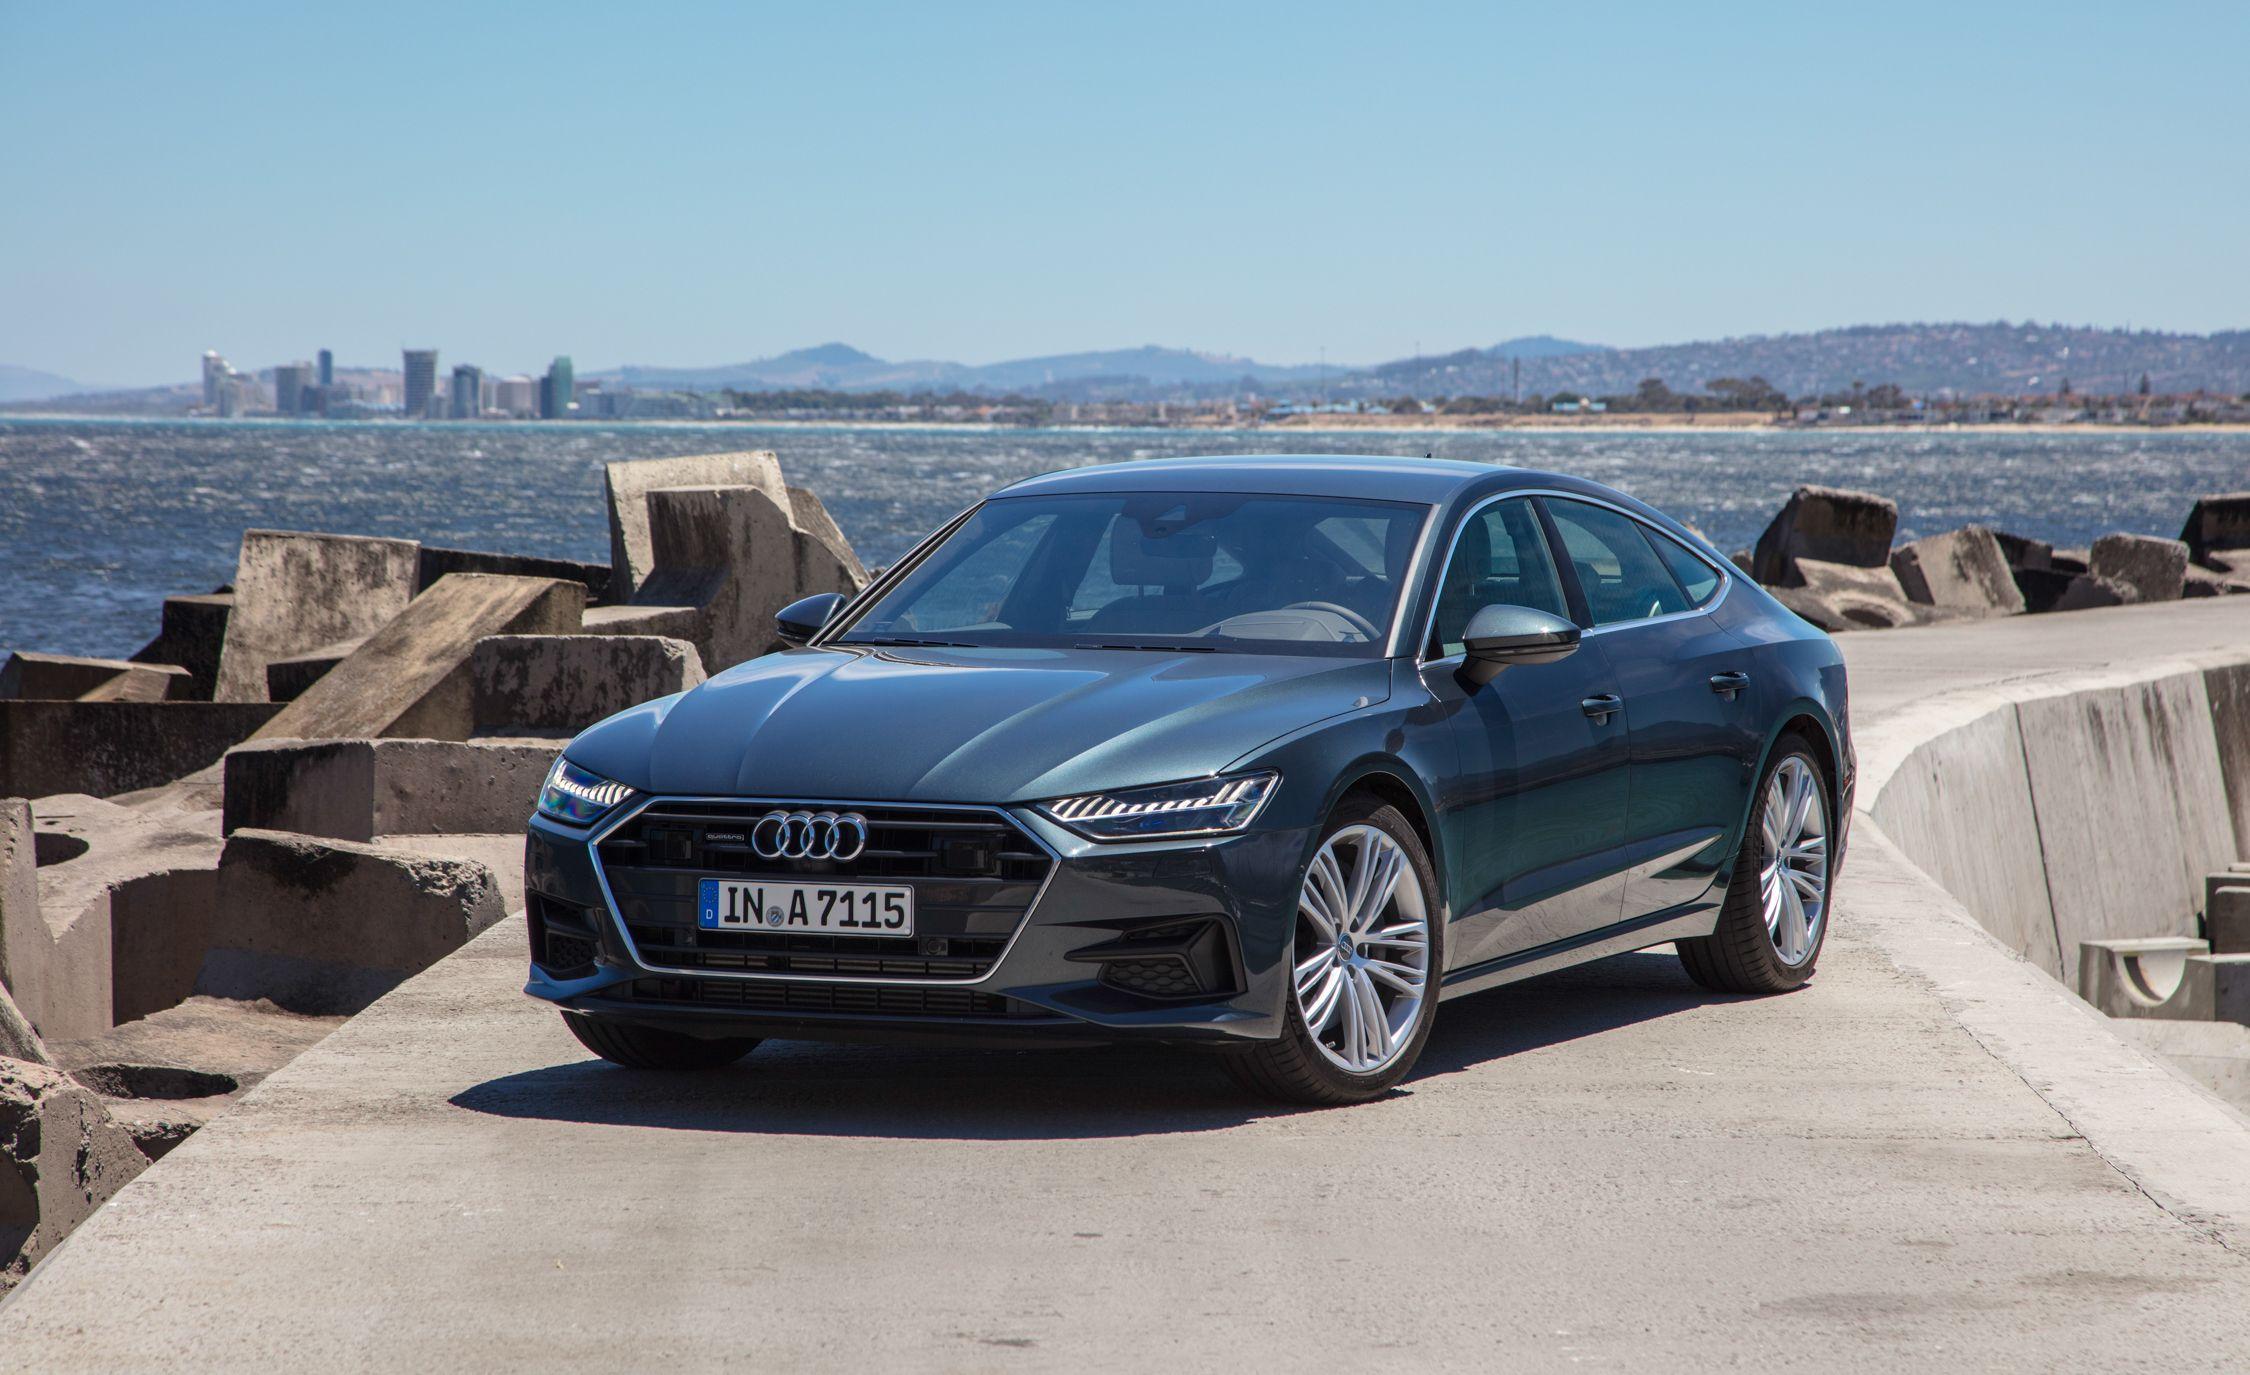 2019-Audi-A7-Sportback-172-1.jpg